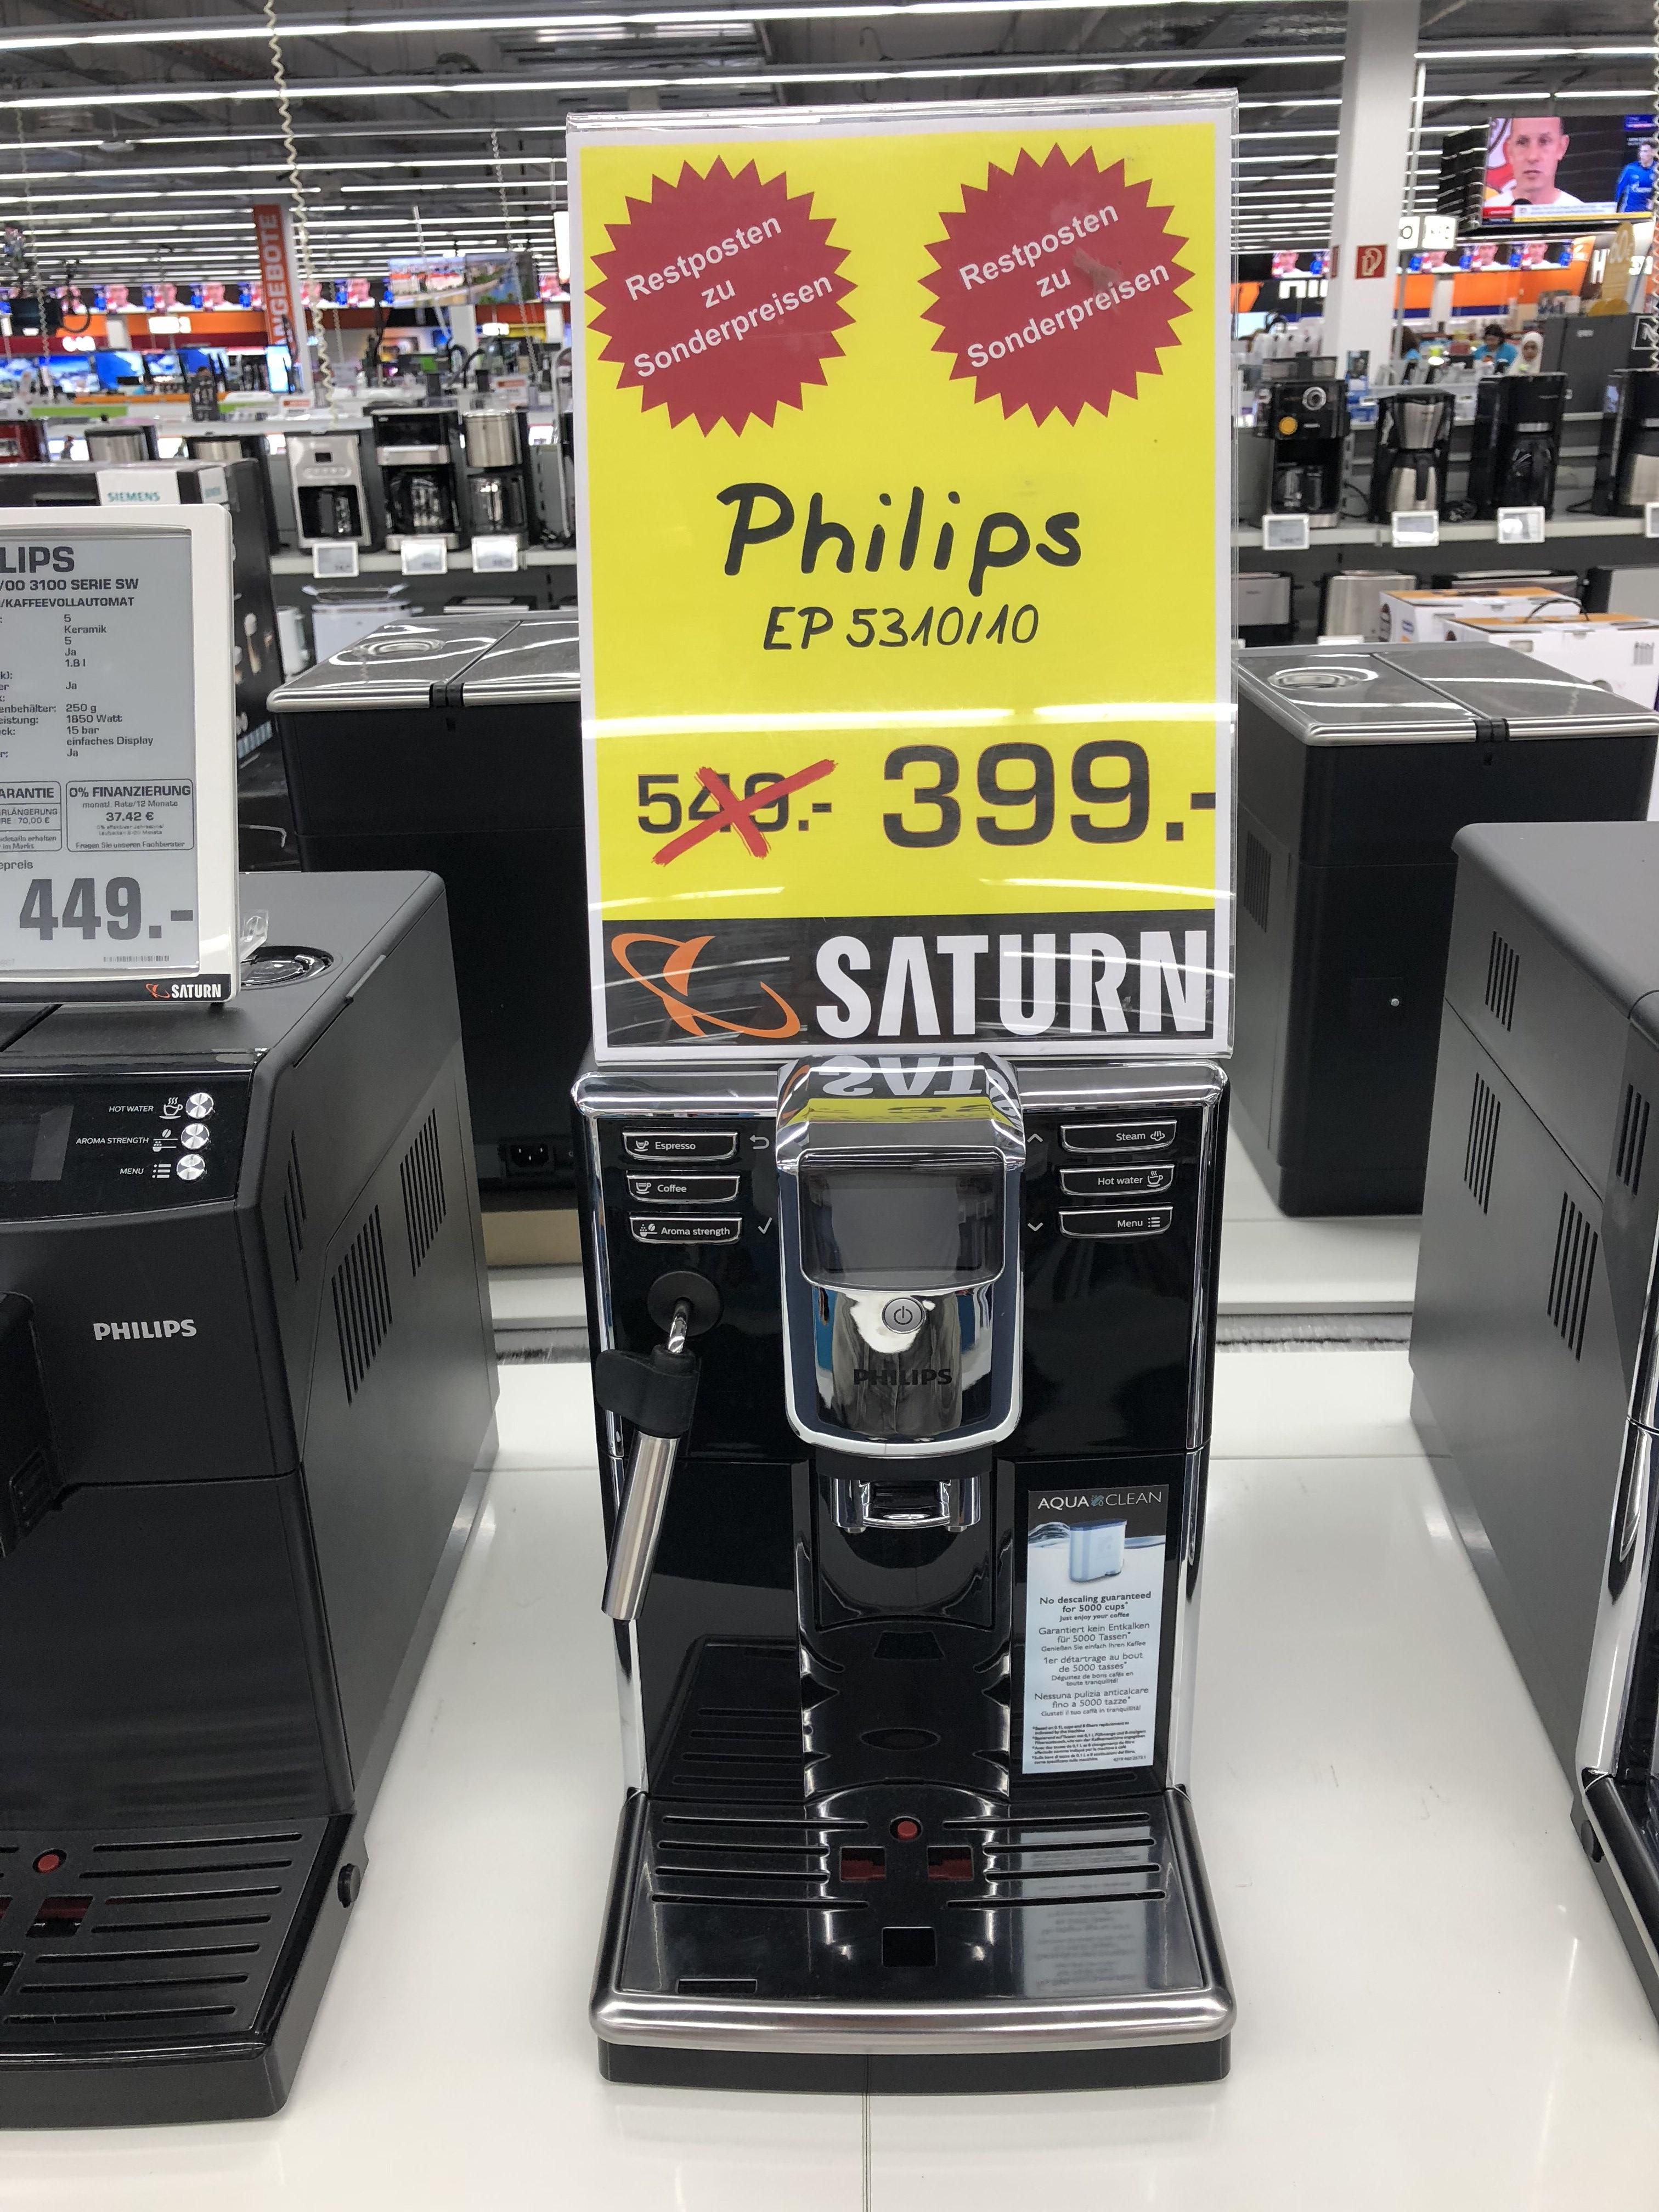 Philips EP 5310/10 Kaffeevollautomat im Saturn Markt Dortmund Eving